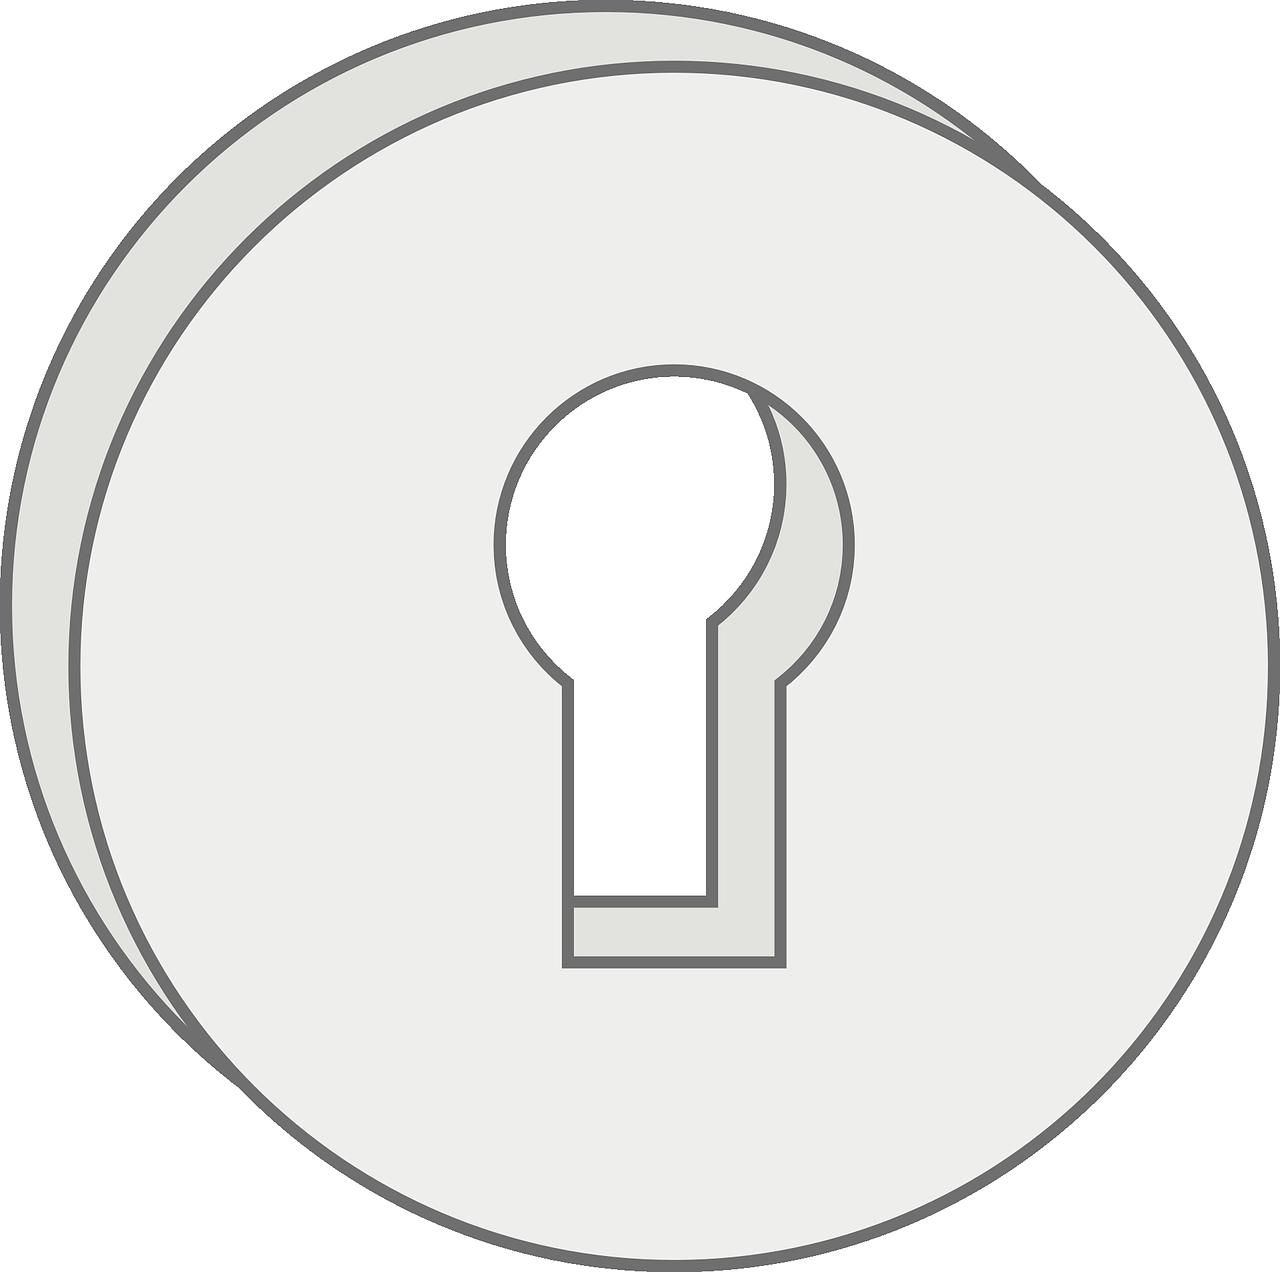 keyhole, keyhole plate, lock